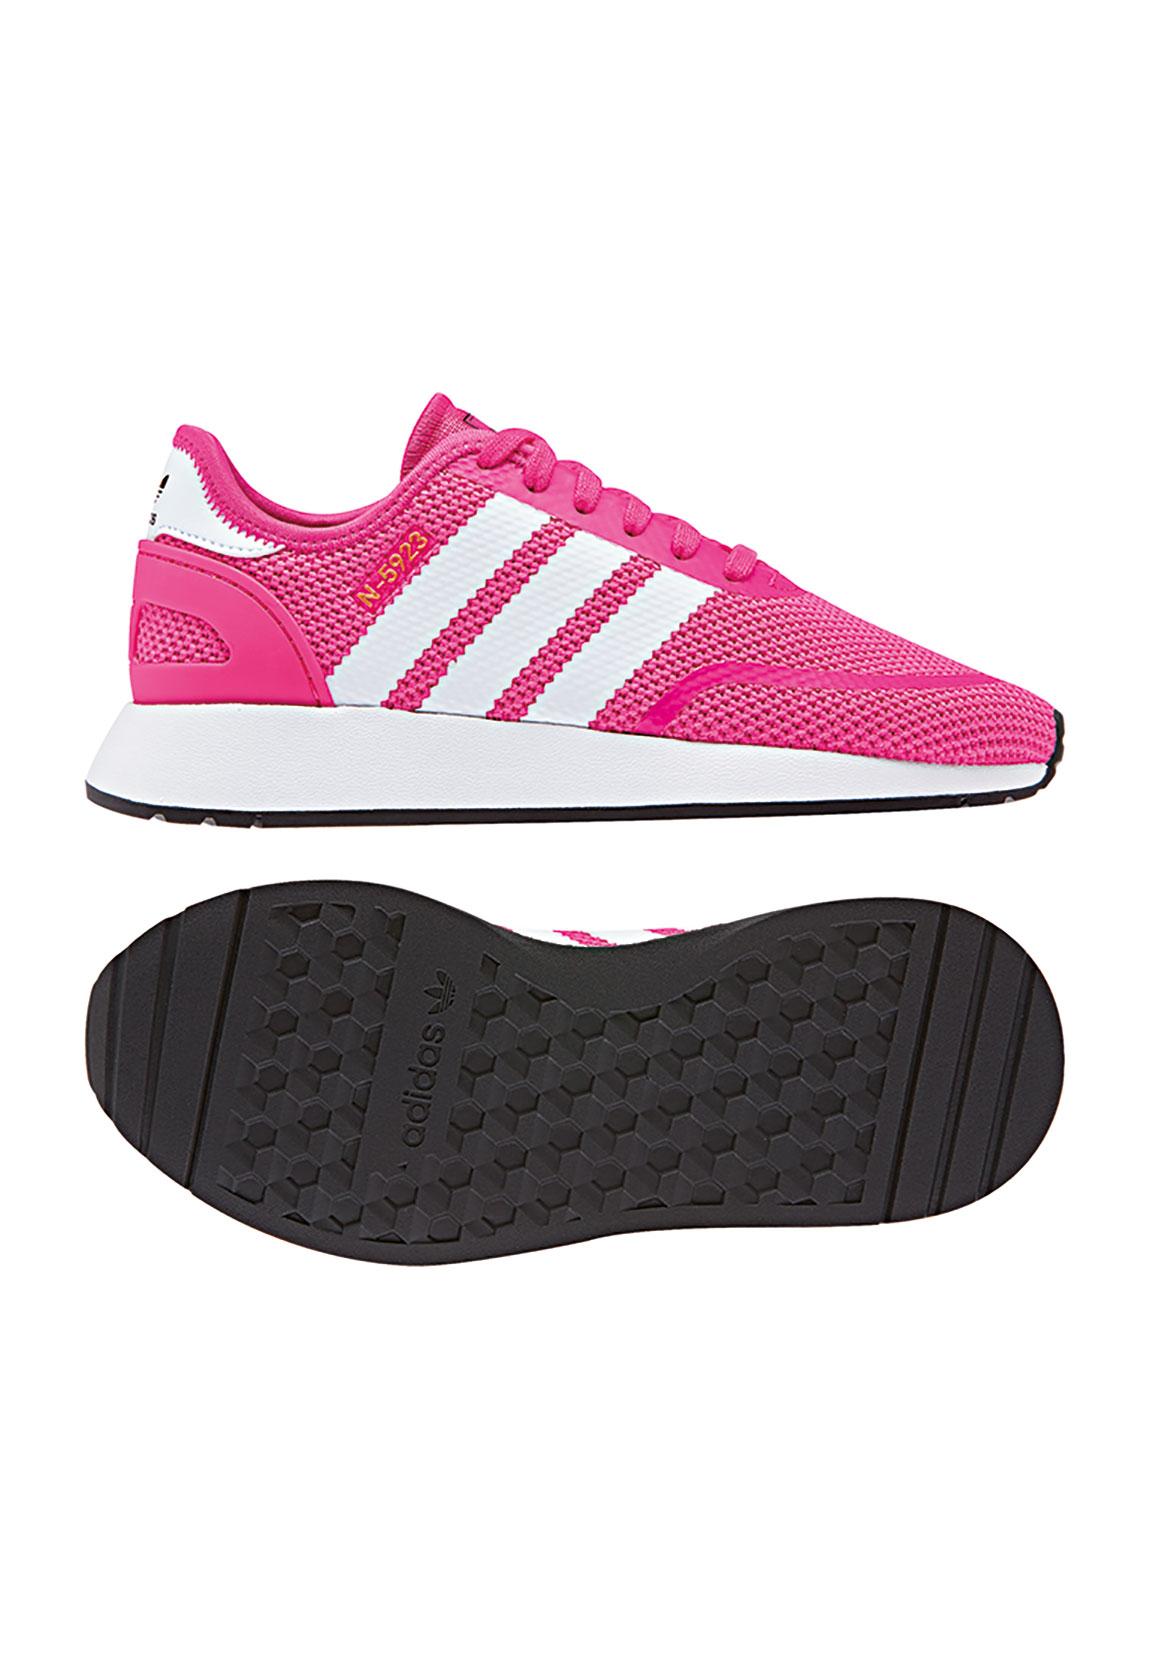 adidas Originals Sneaker N-5923 B41572 Pink